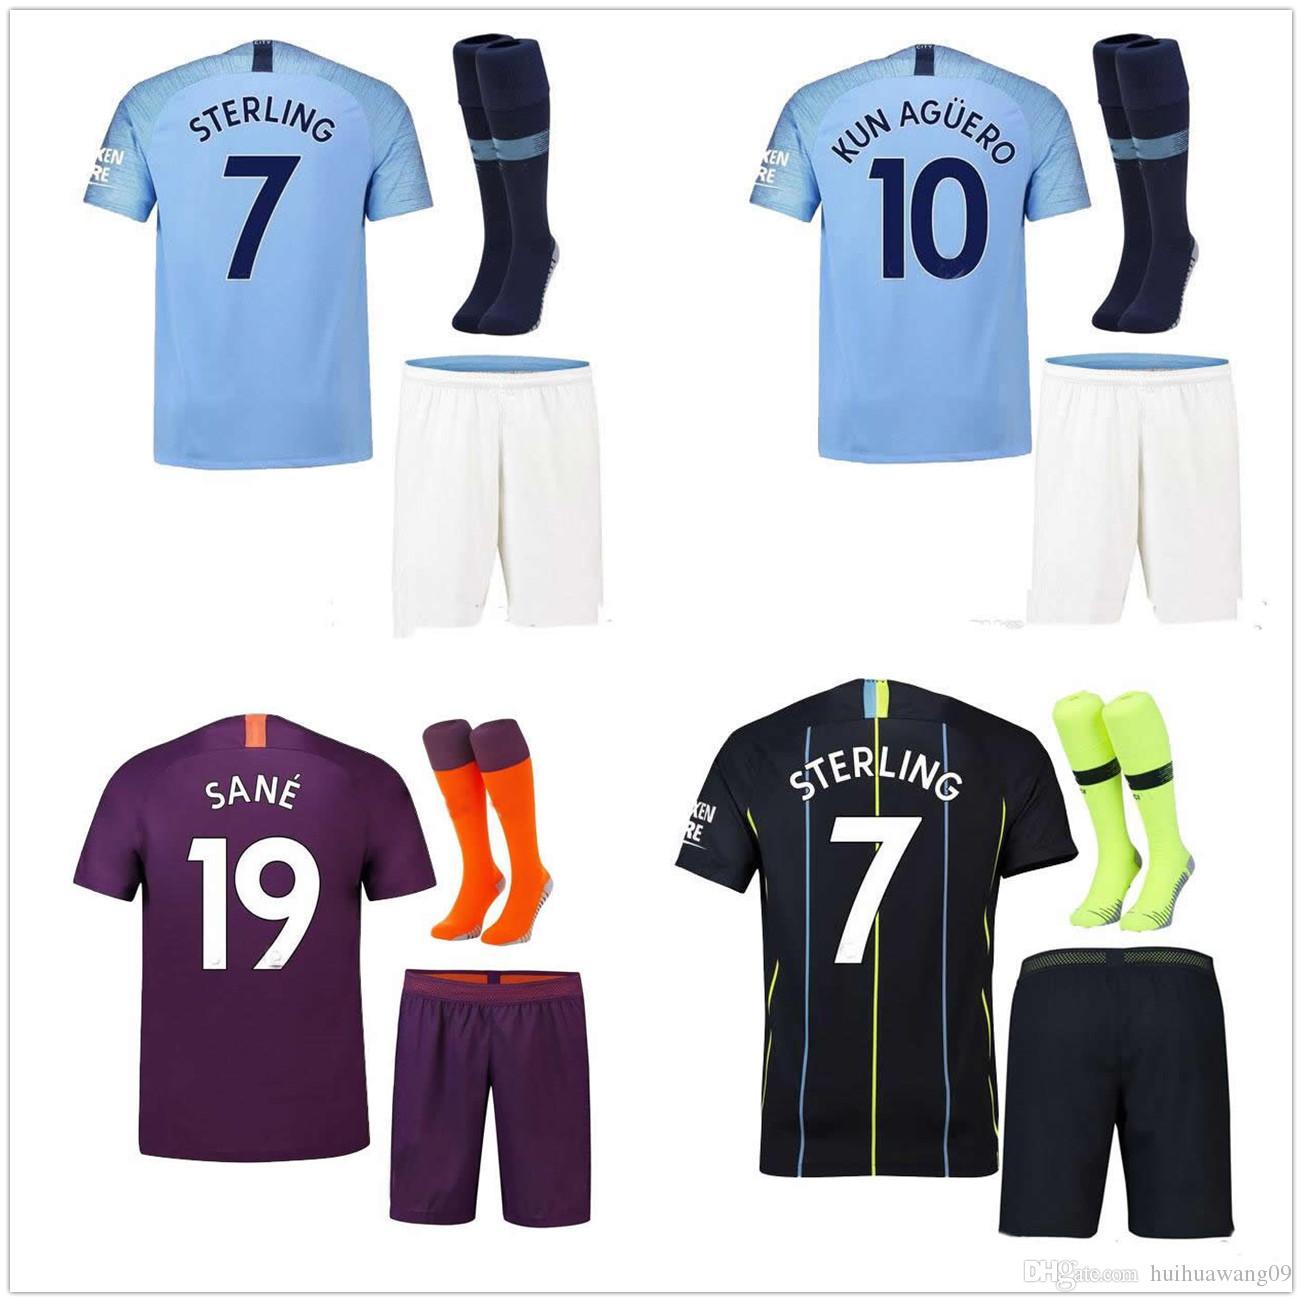 778a7893f89 2019 2018 19 KUN AGUERO THIRD ADULT Kit AWAY SOCCER JERSEYS MAHREZ STERLING  HOME 18 19 Manchester SANE DE BRUYNE G.JESUS City FOOTBALL Sets From ...